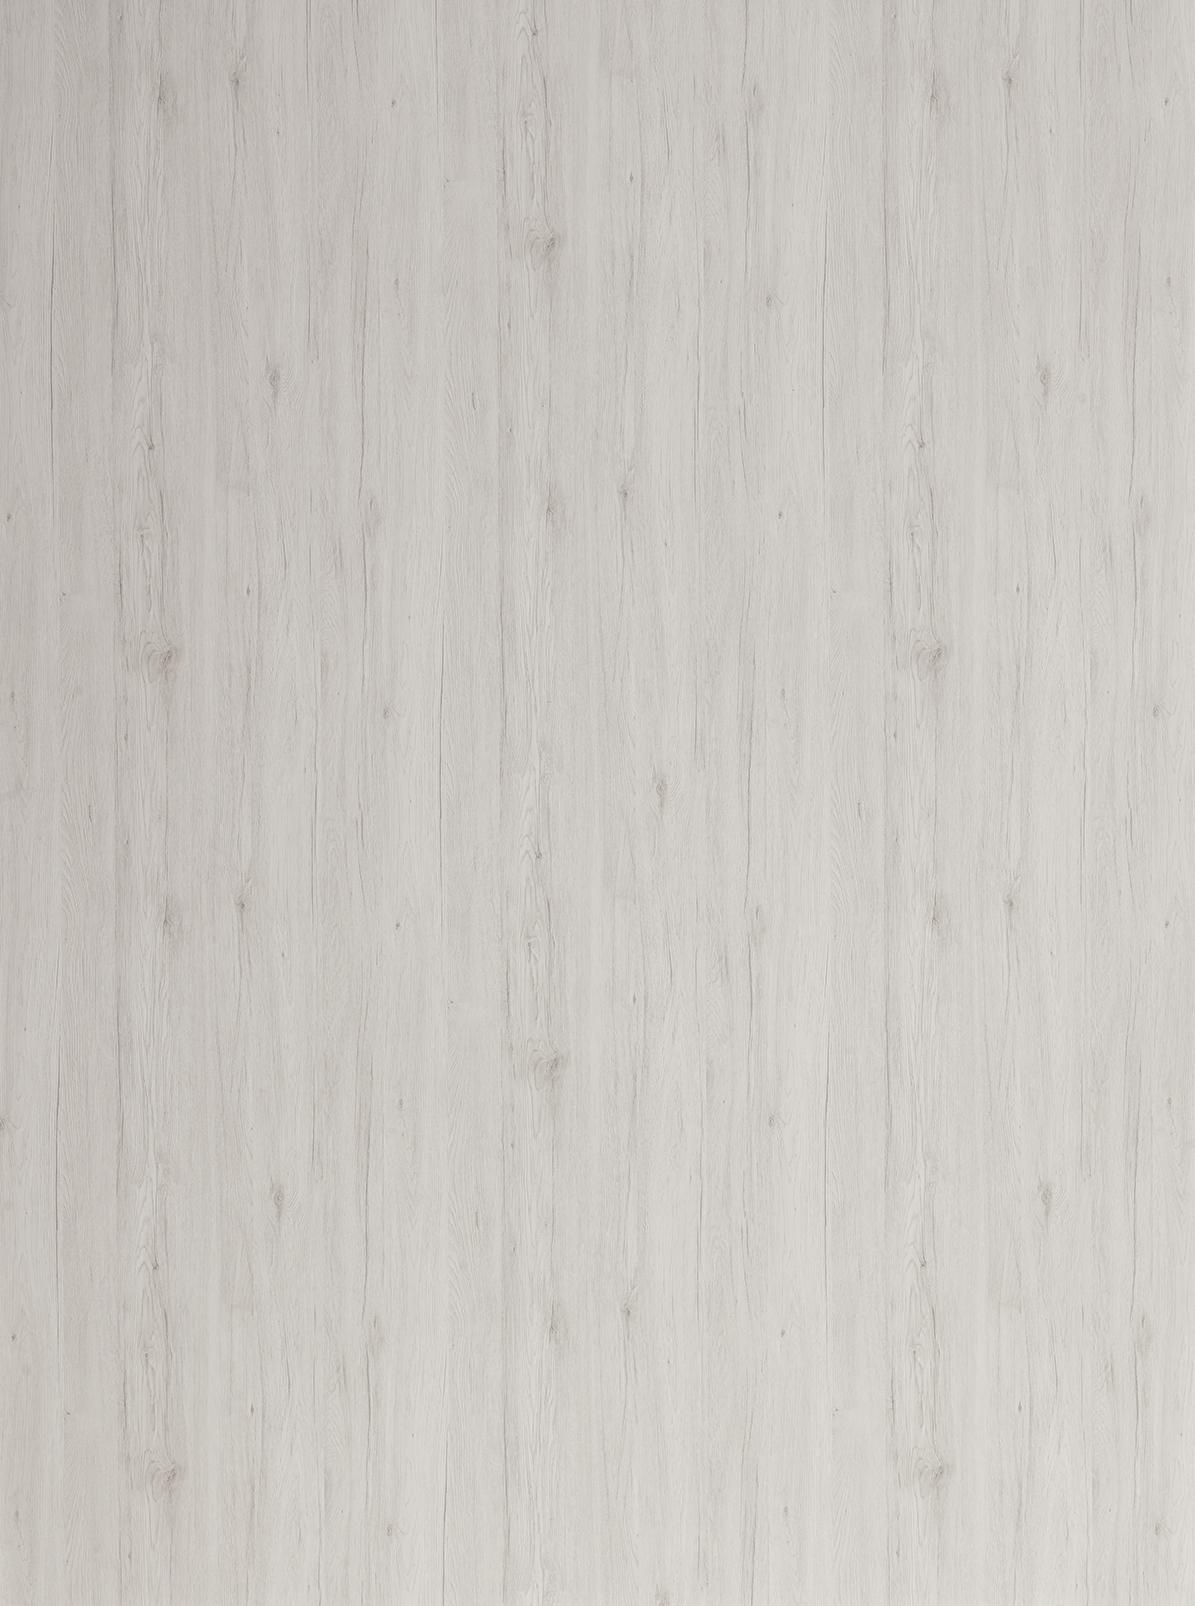 אלון לבן KH01DT08